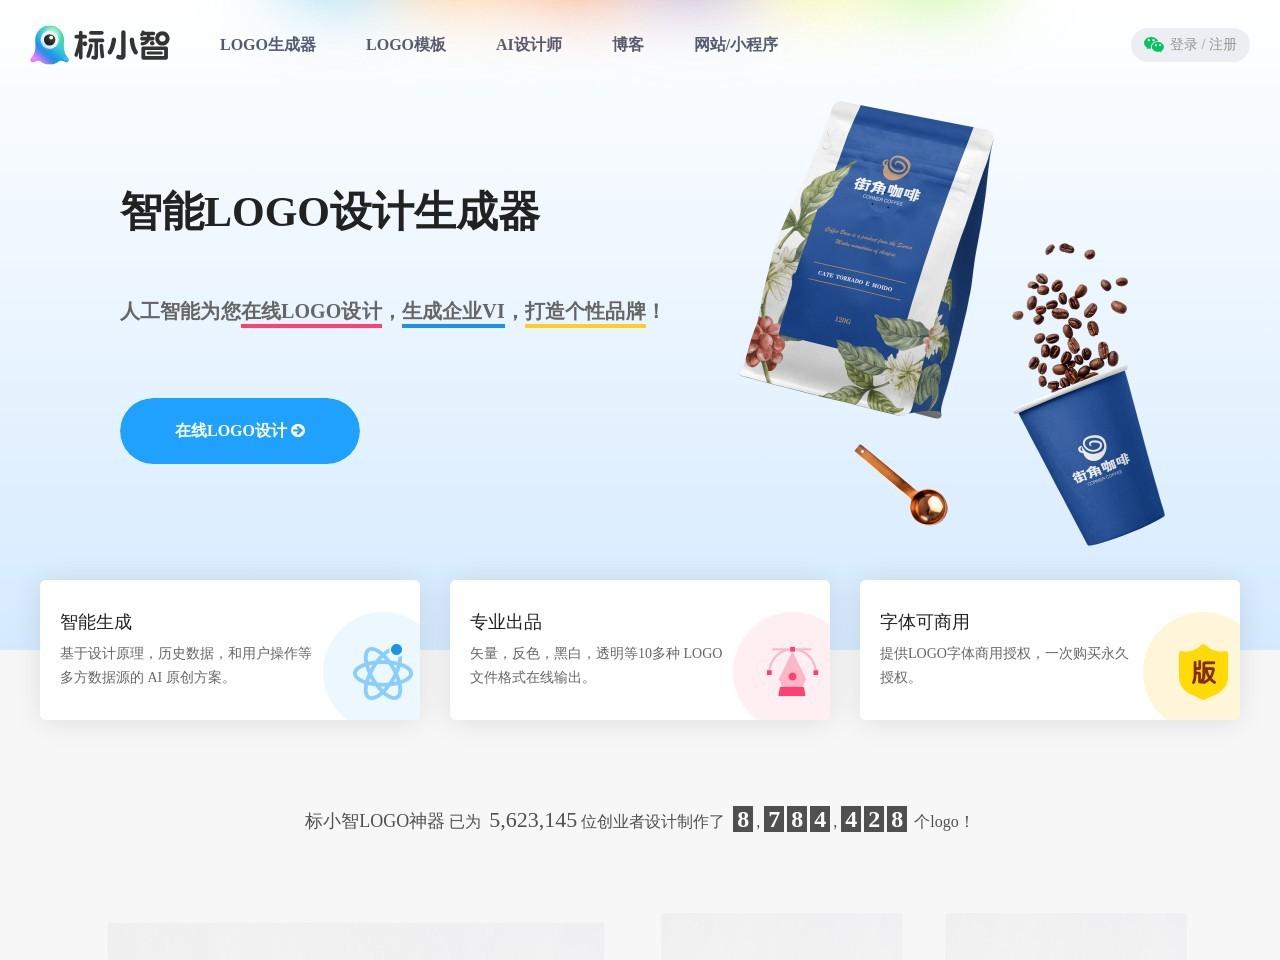 logosc_人工智能在线设计logo设计